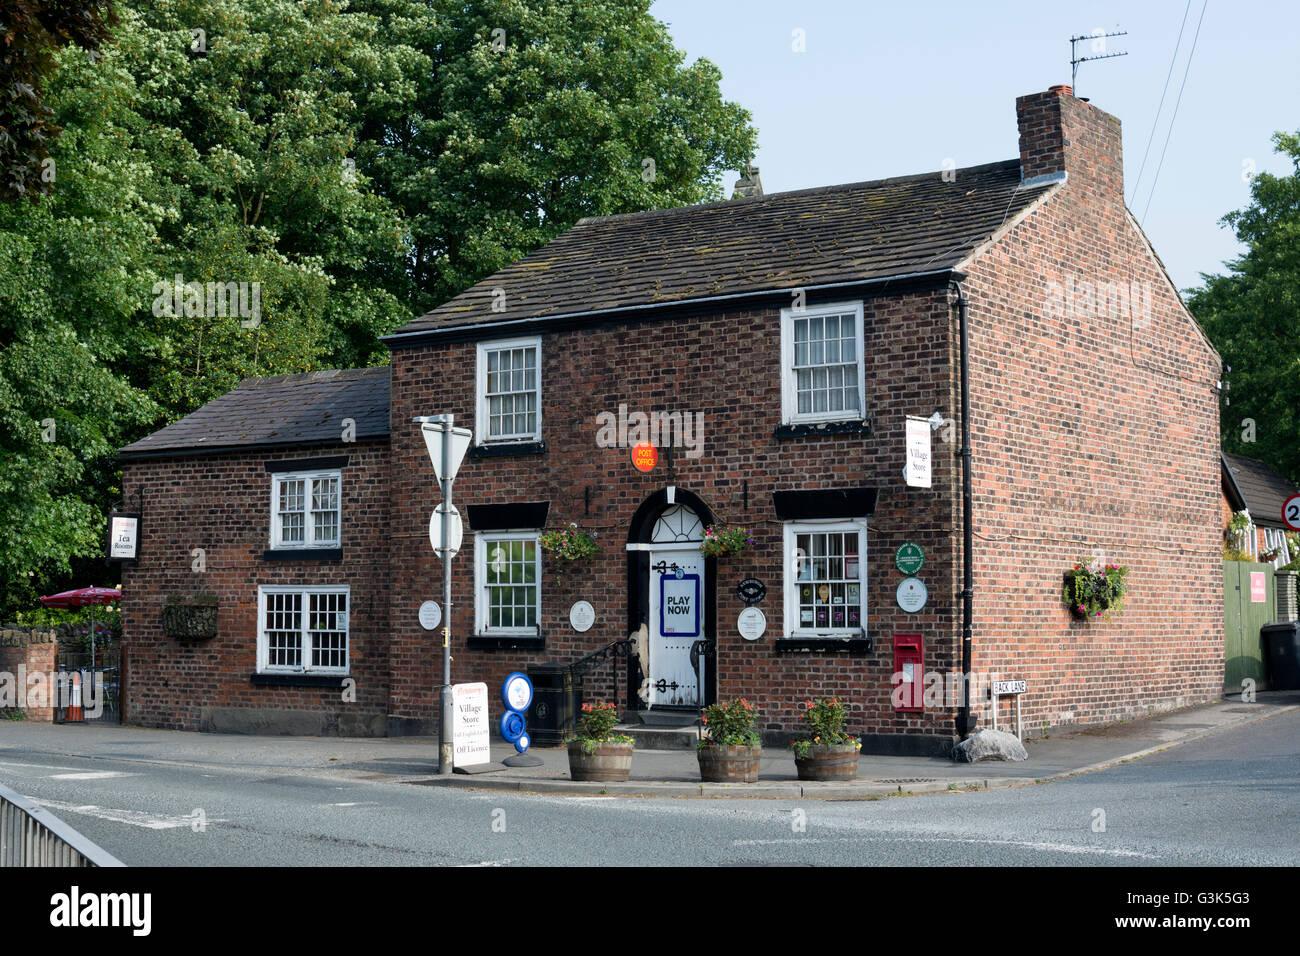 The post office, Newburgh, Lancashire, England, UK - Stock Image